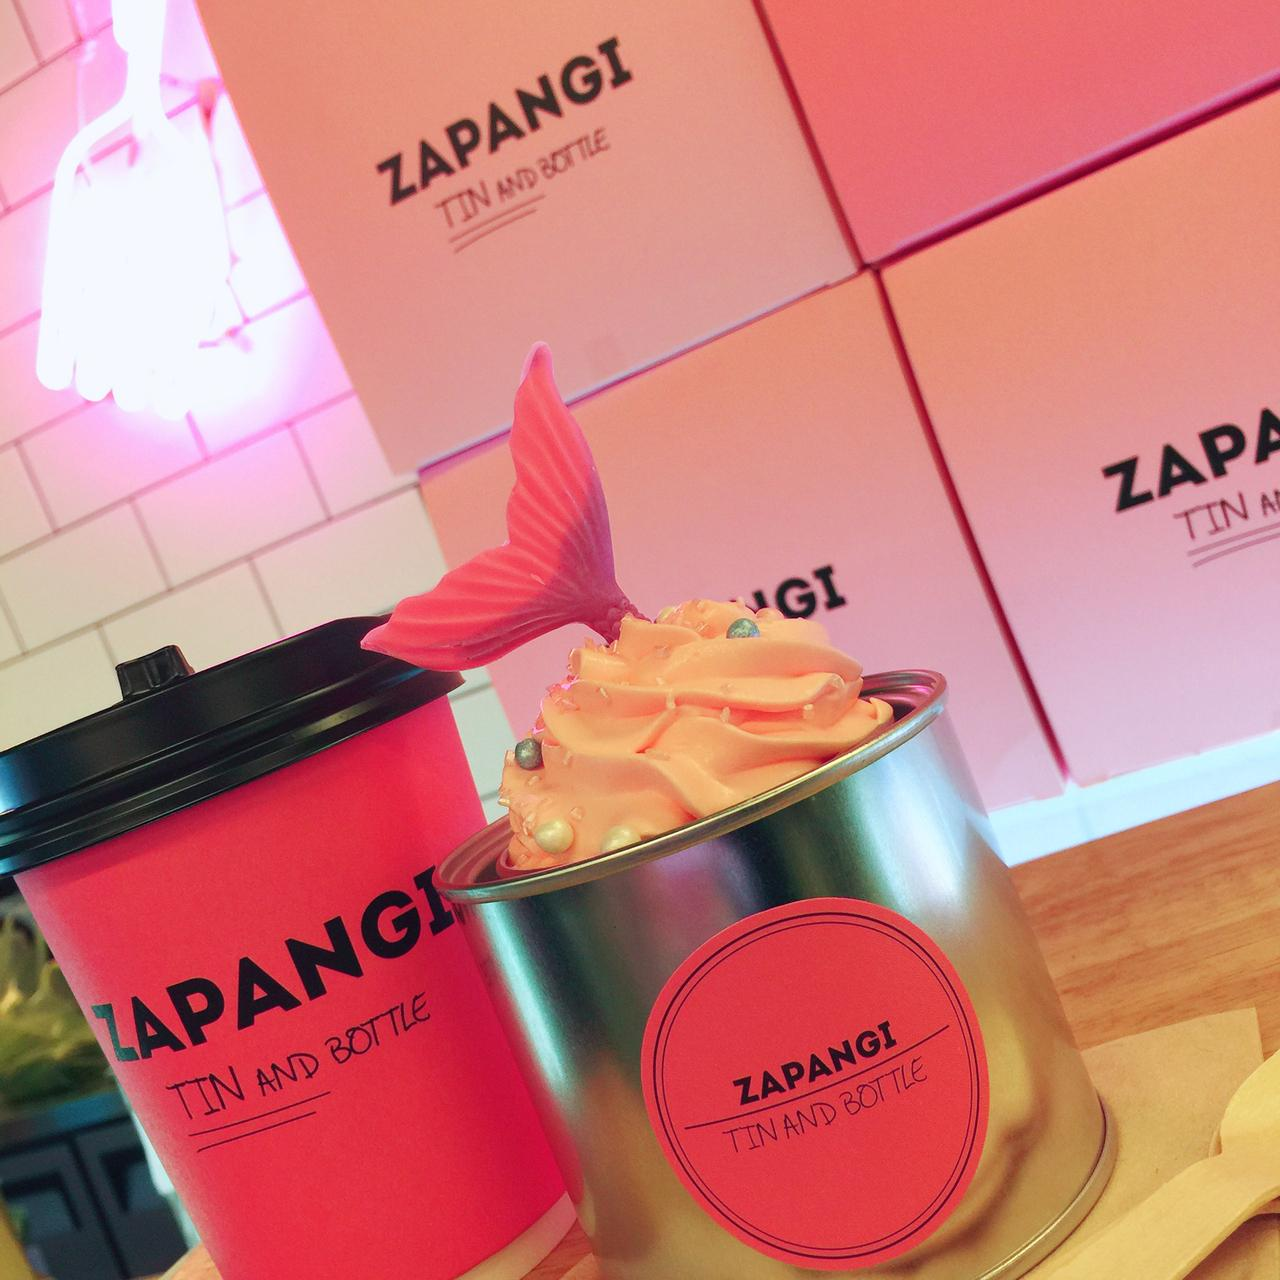 ZAPANGI (チャパンギ)